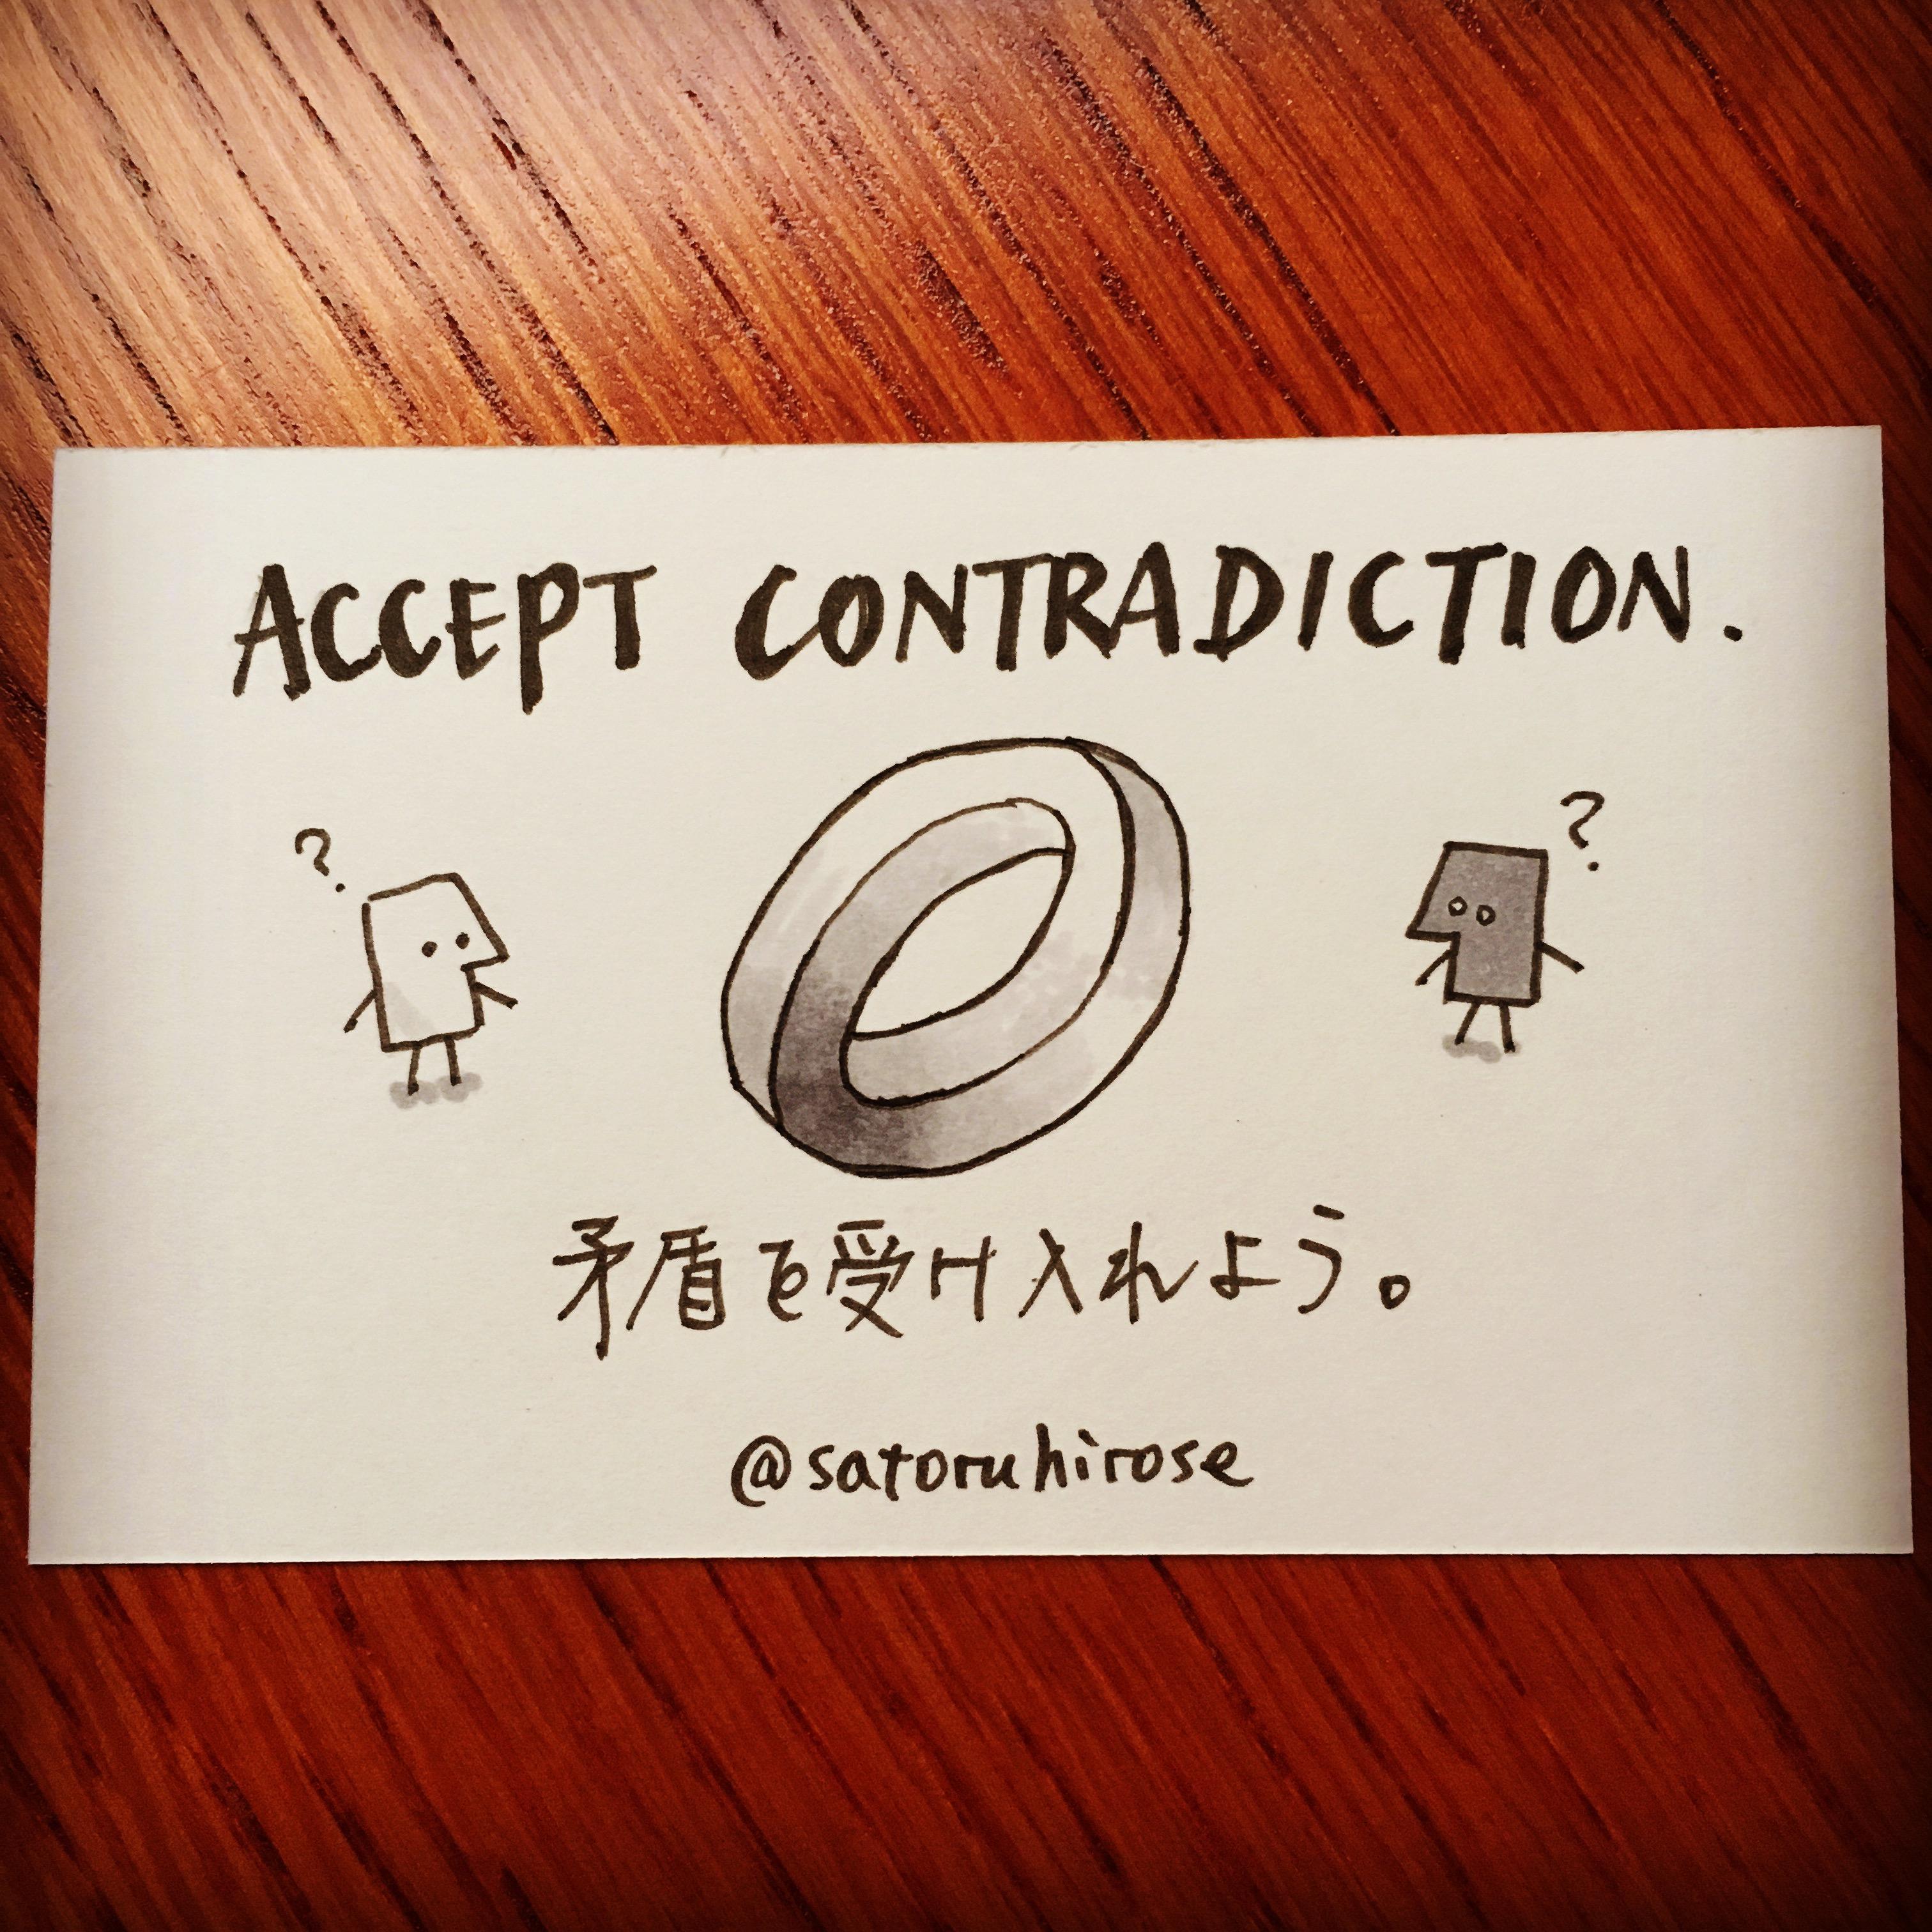 Accept contradiction.